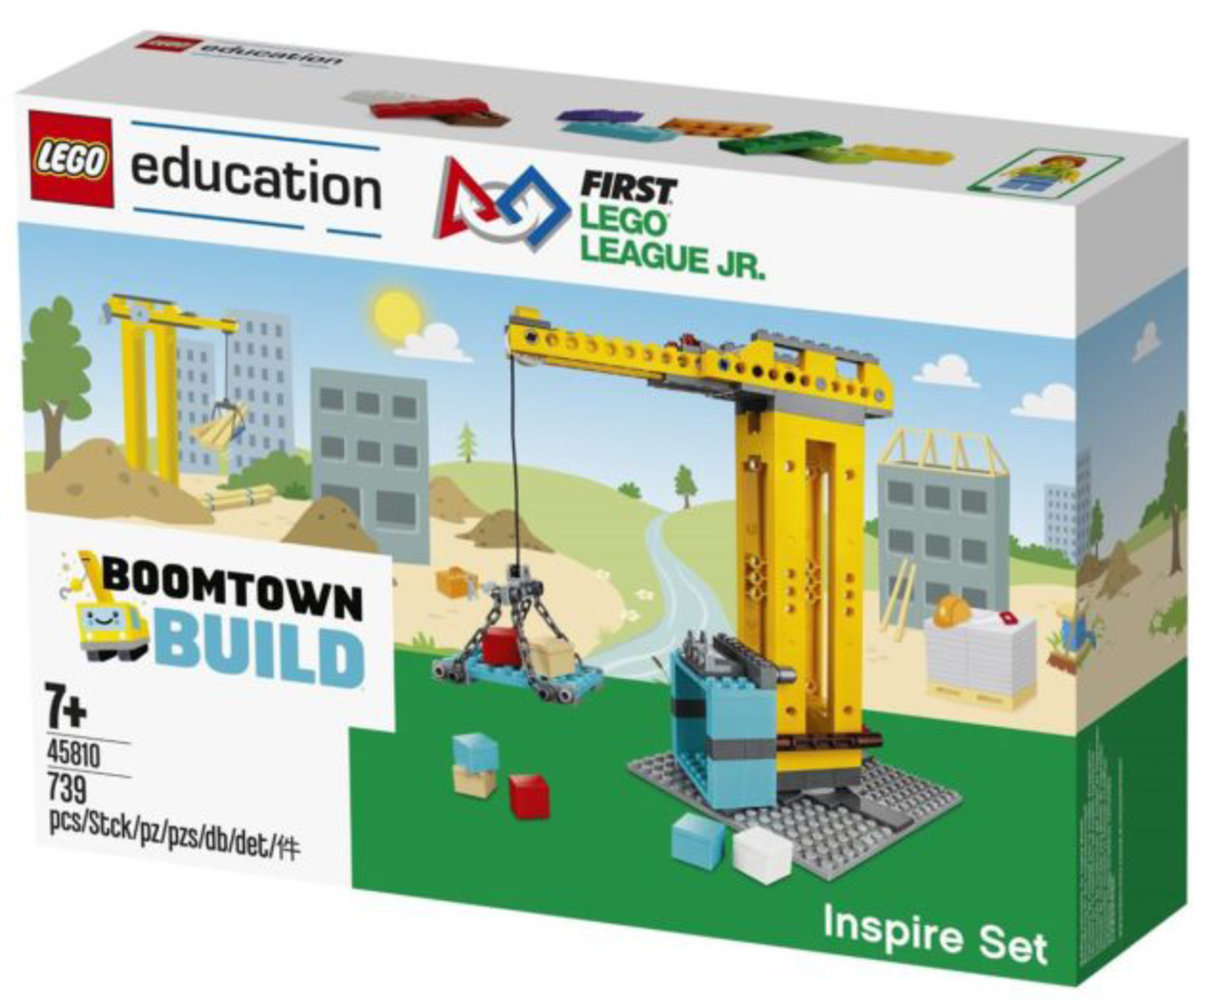 Boomtown Build Inspire Set